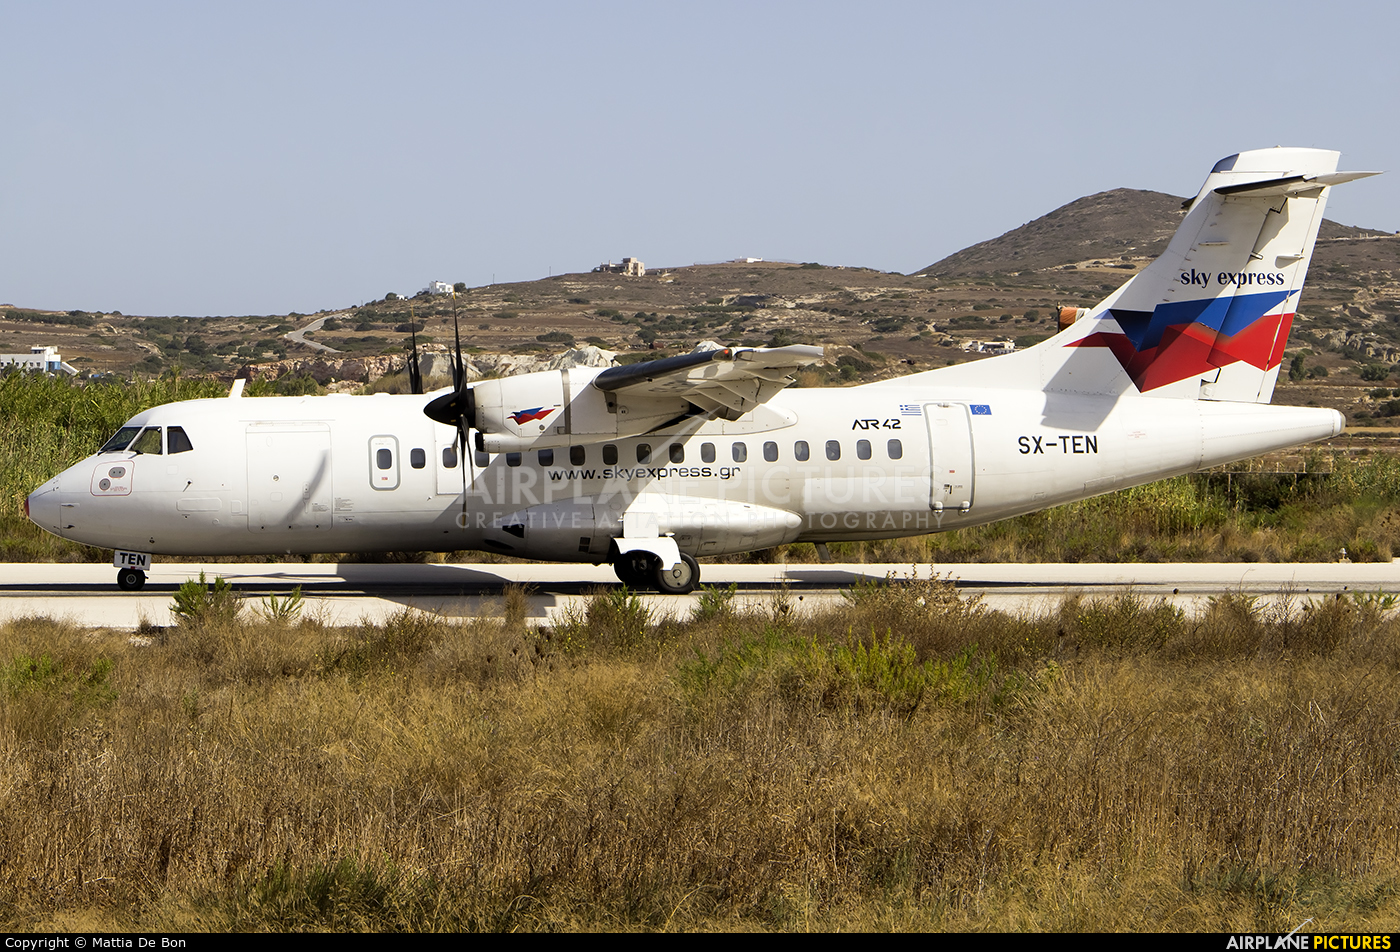 Sky Express SX-TEN aircraft at Off Airport - Greece